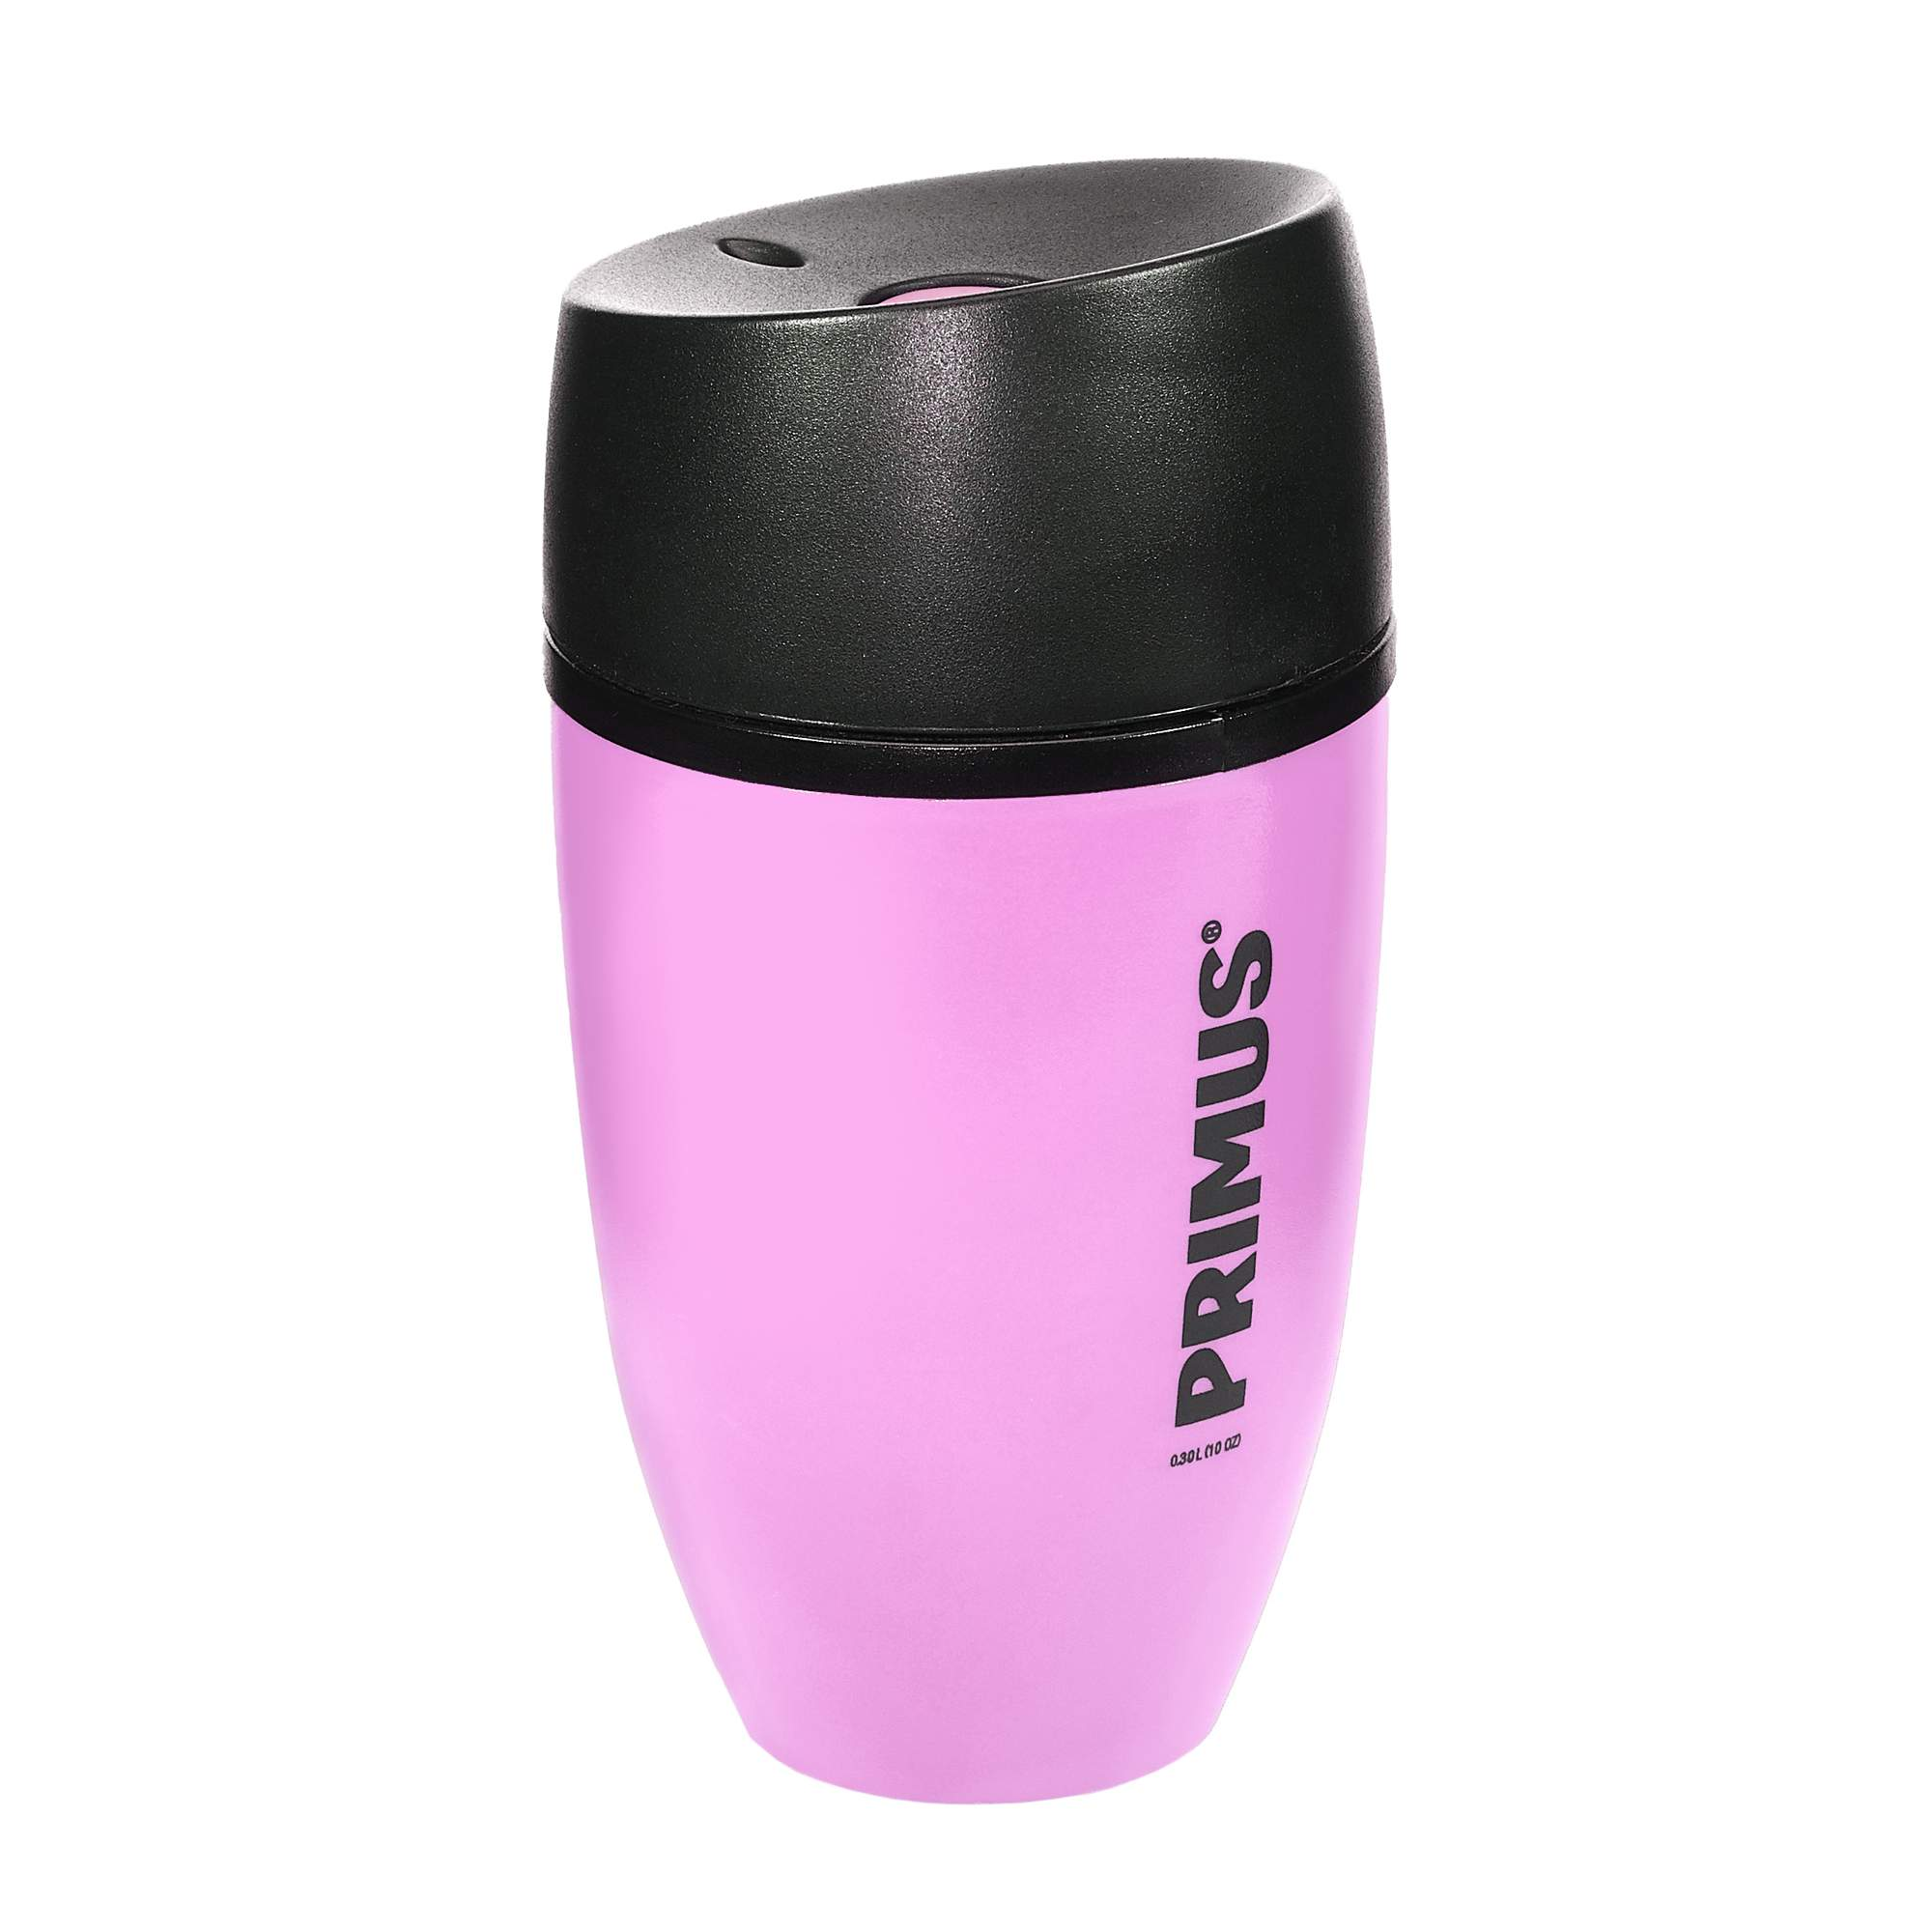 Primus Commuter Mug - Thermobecher - pink-rosa